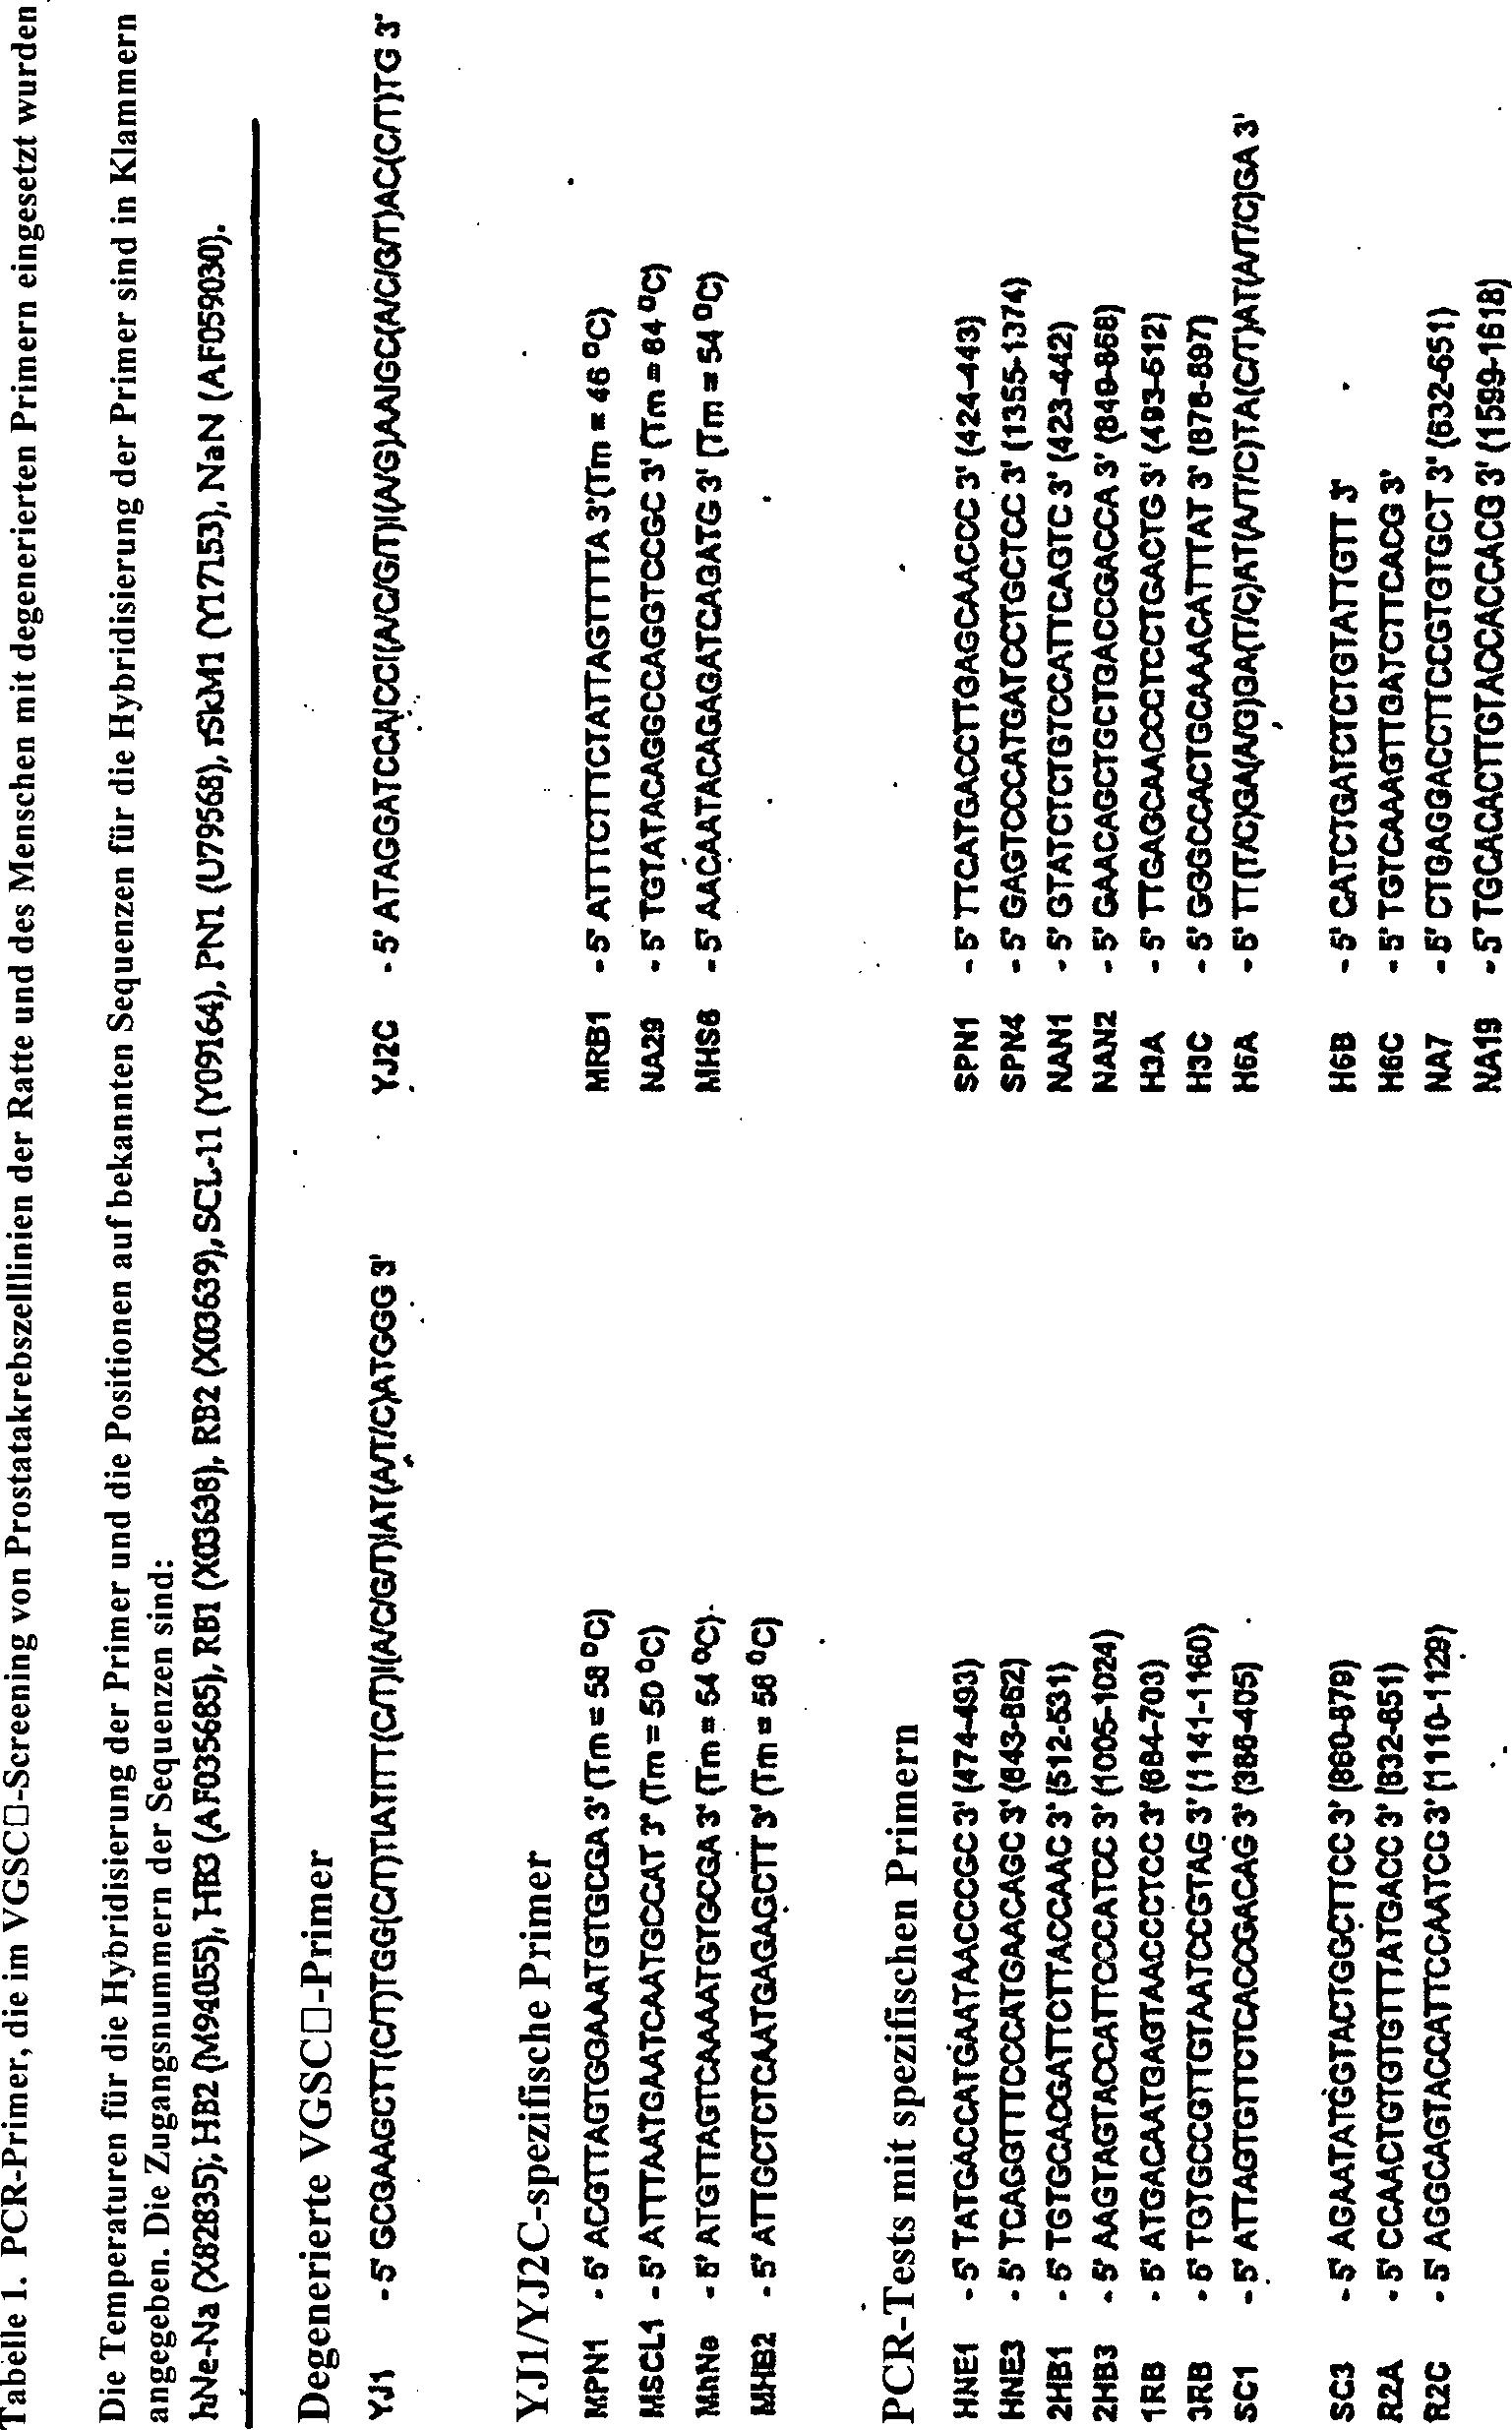 neoplasia di prostata metastatic cider vinegar